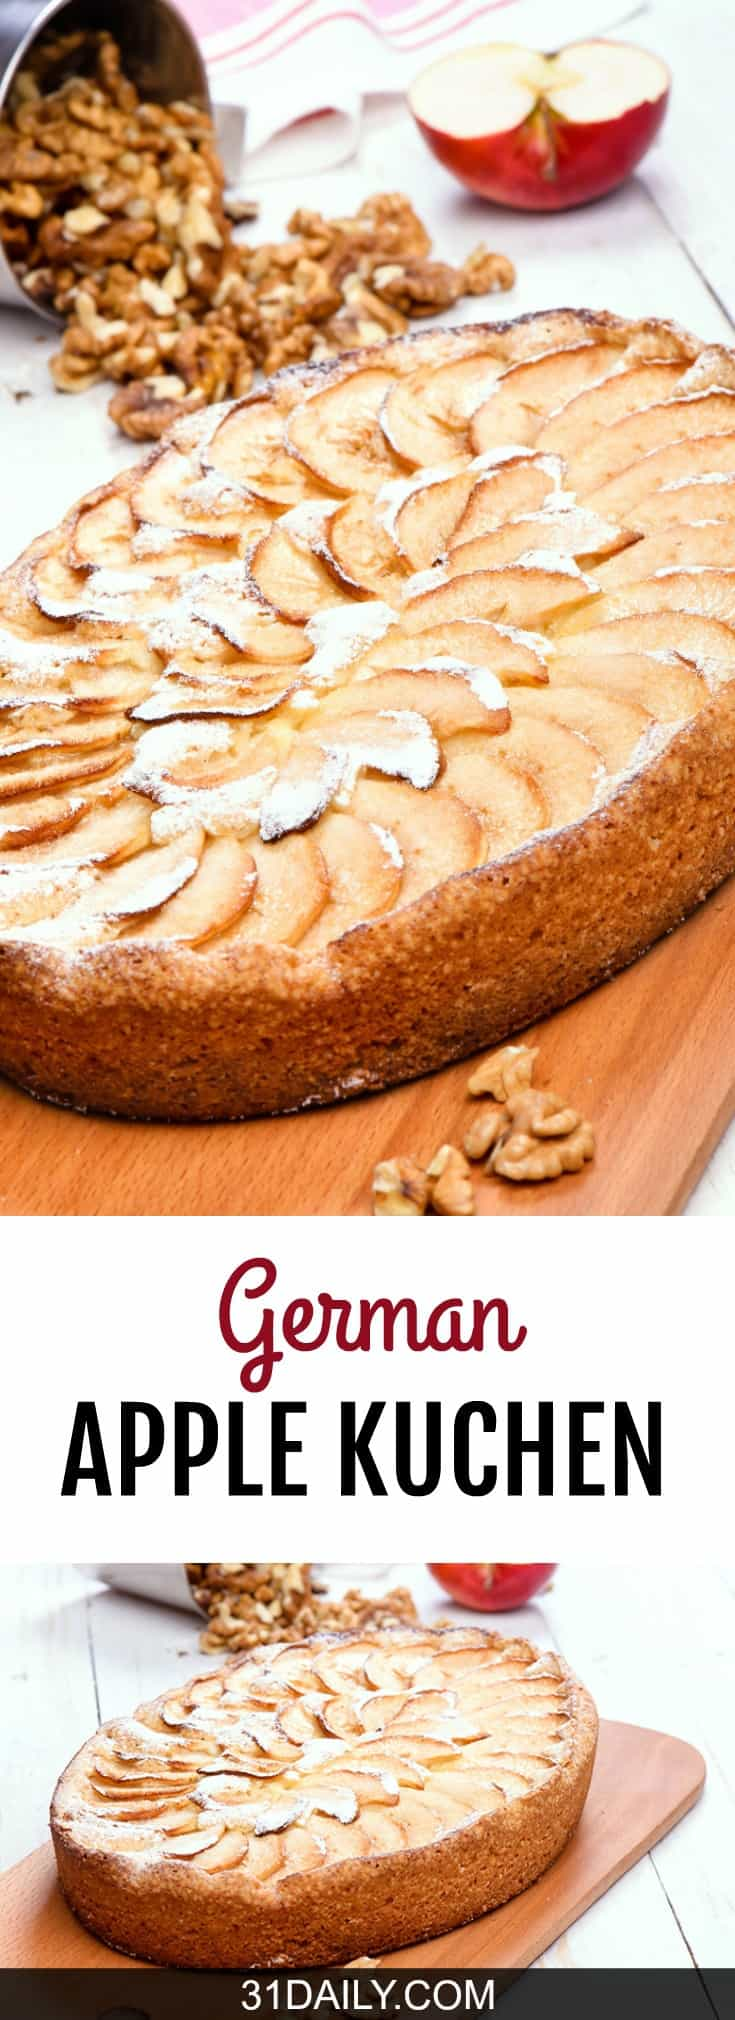 German Apple Kuchen | 31Daily.com